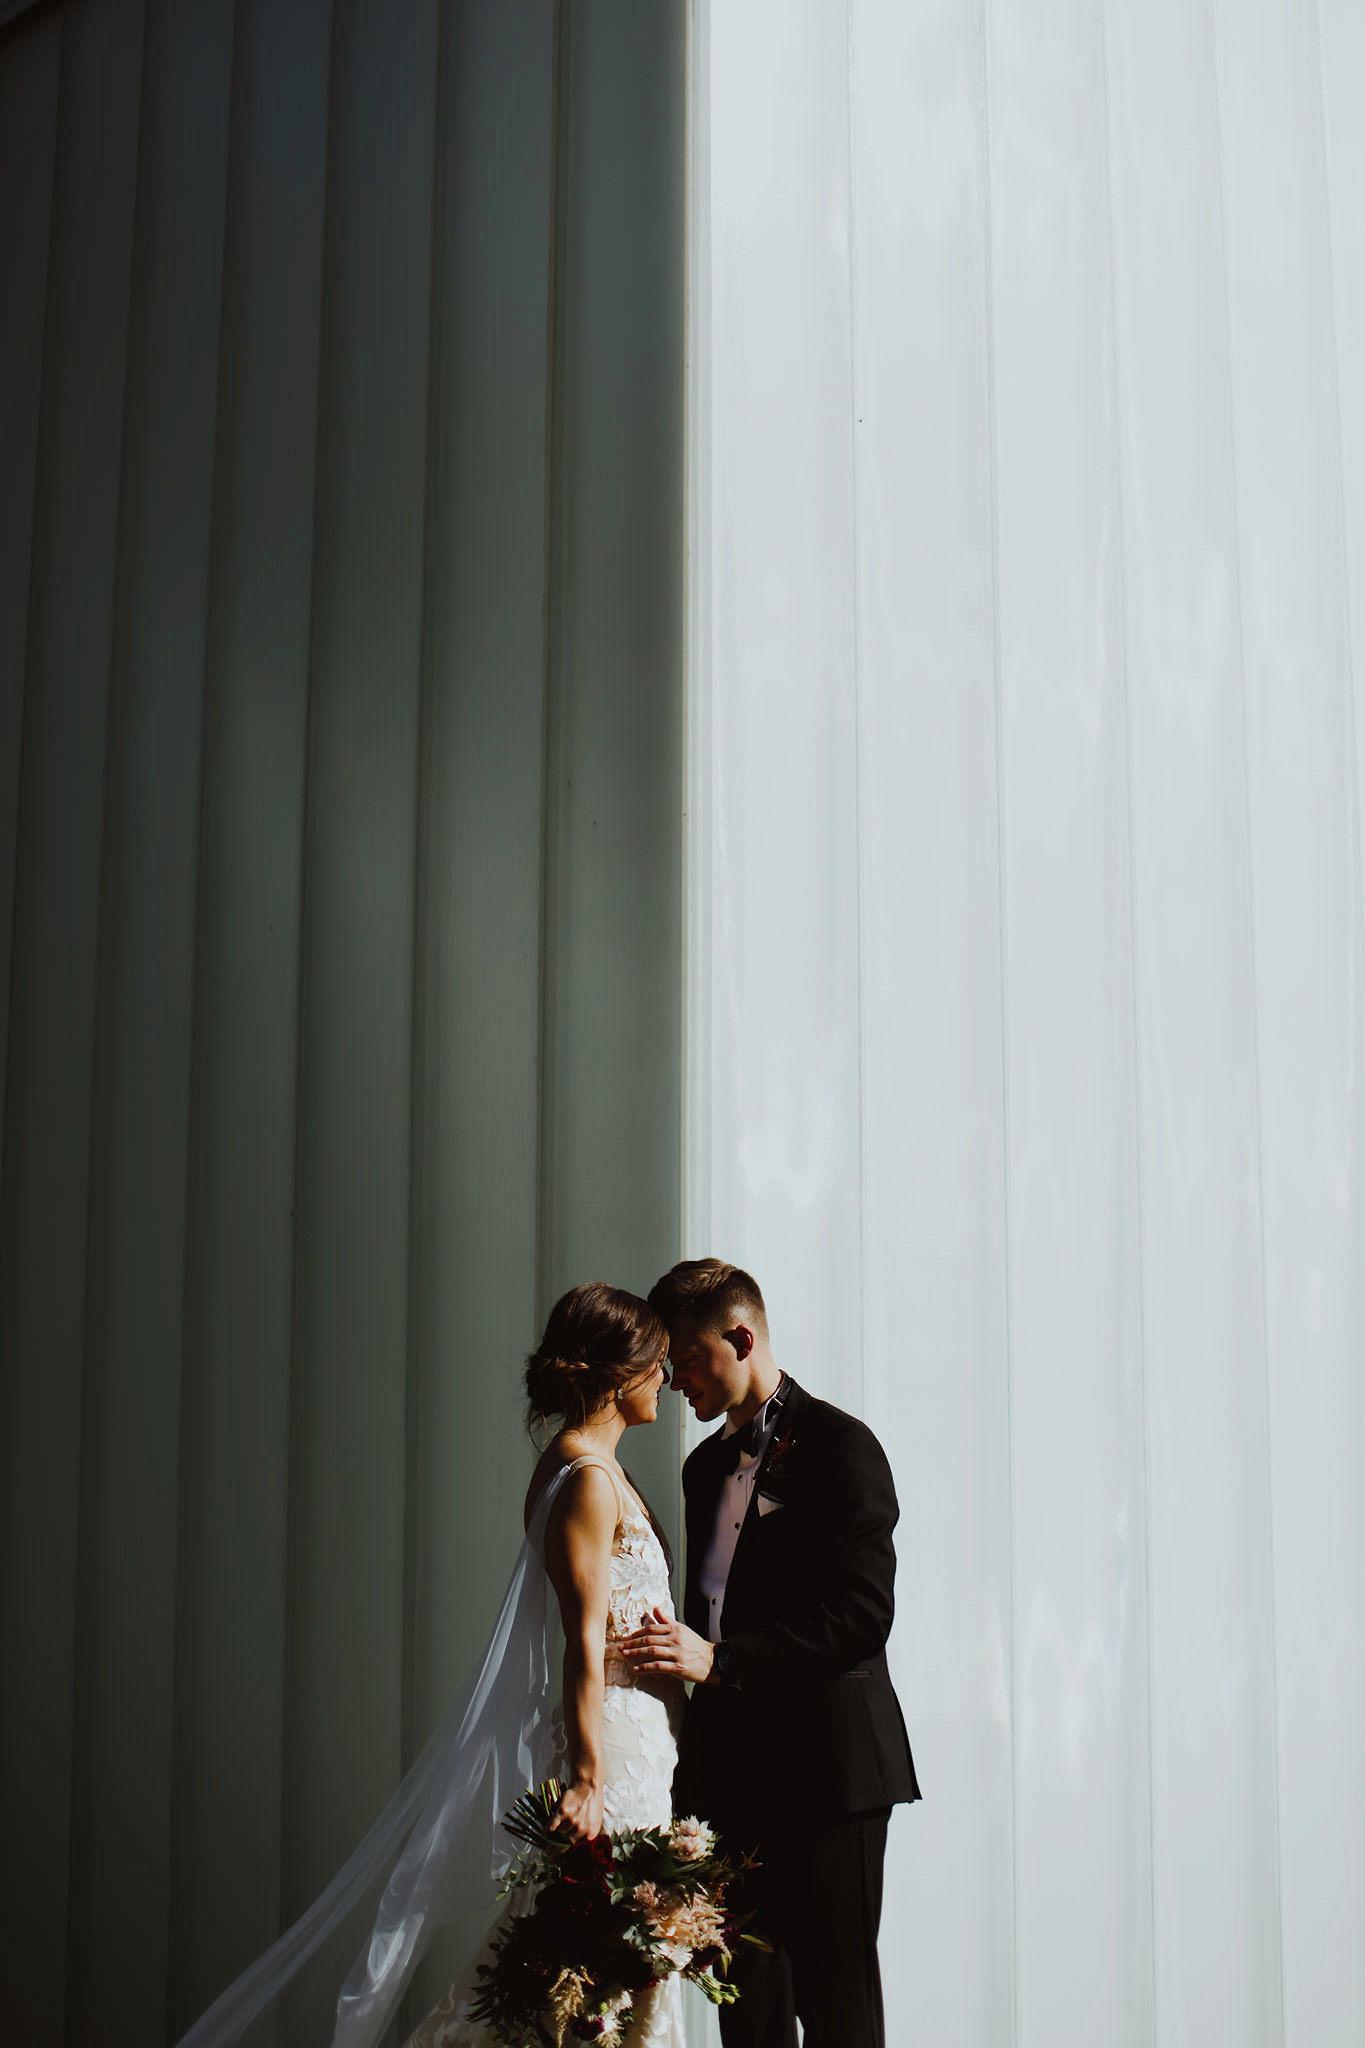 Feast of Fancy-Hobbs Building Wedding_Cinder Block Brewery Wedding_Kindling Wedding Photography_05.JPG